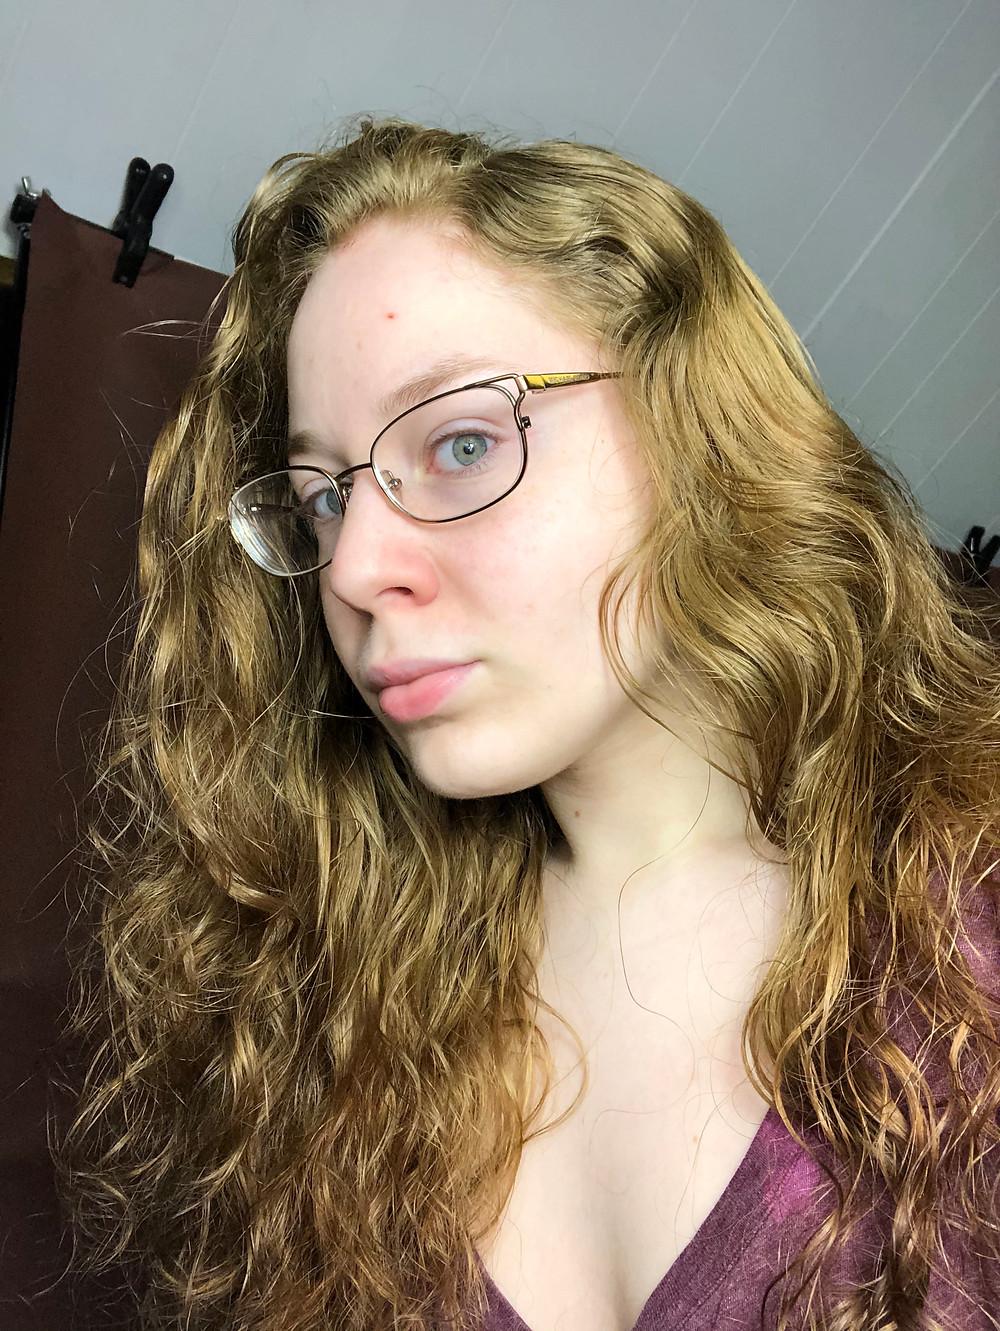 Red To Blonde Hair Color IN ONE WEEK VLOG 2020 | Lillee Jean